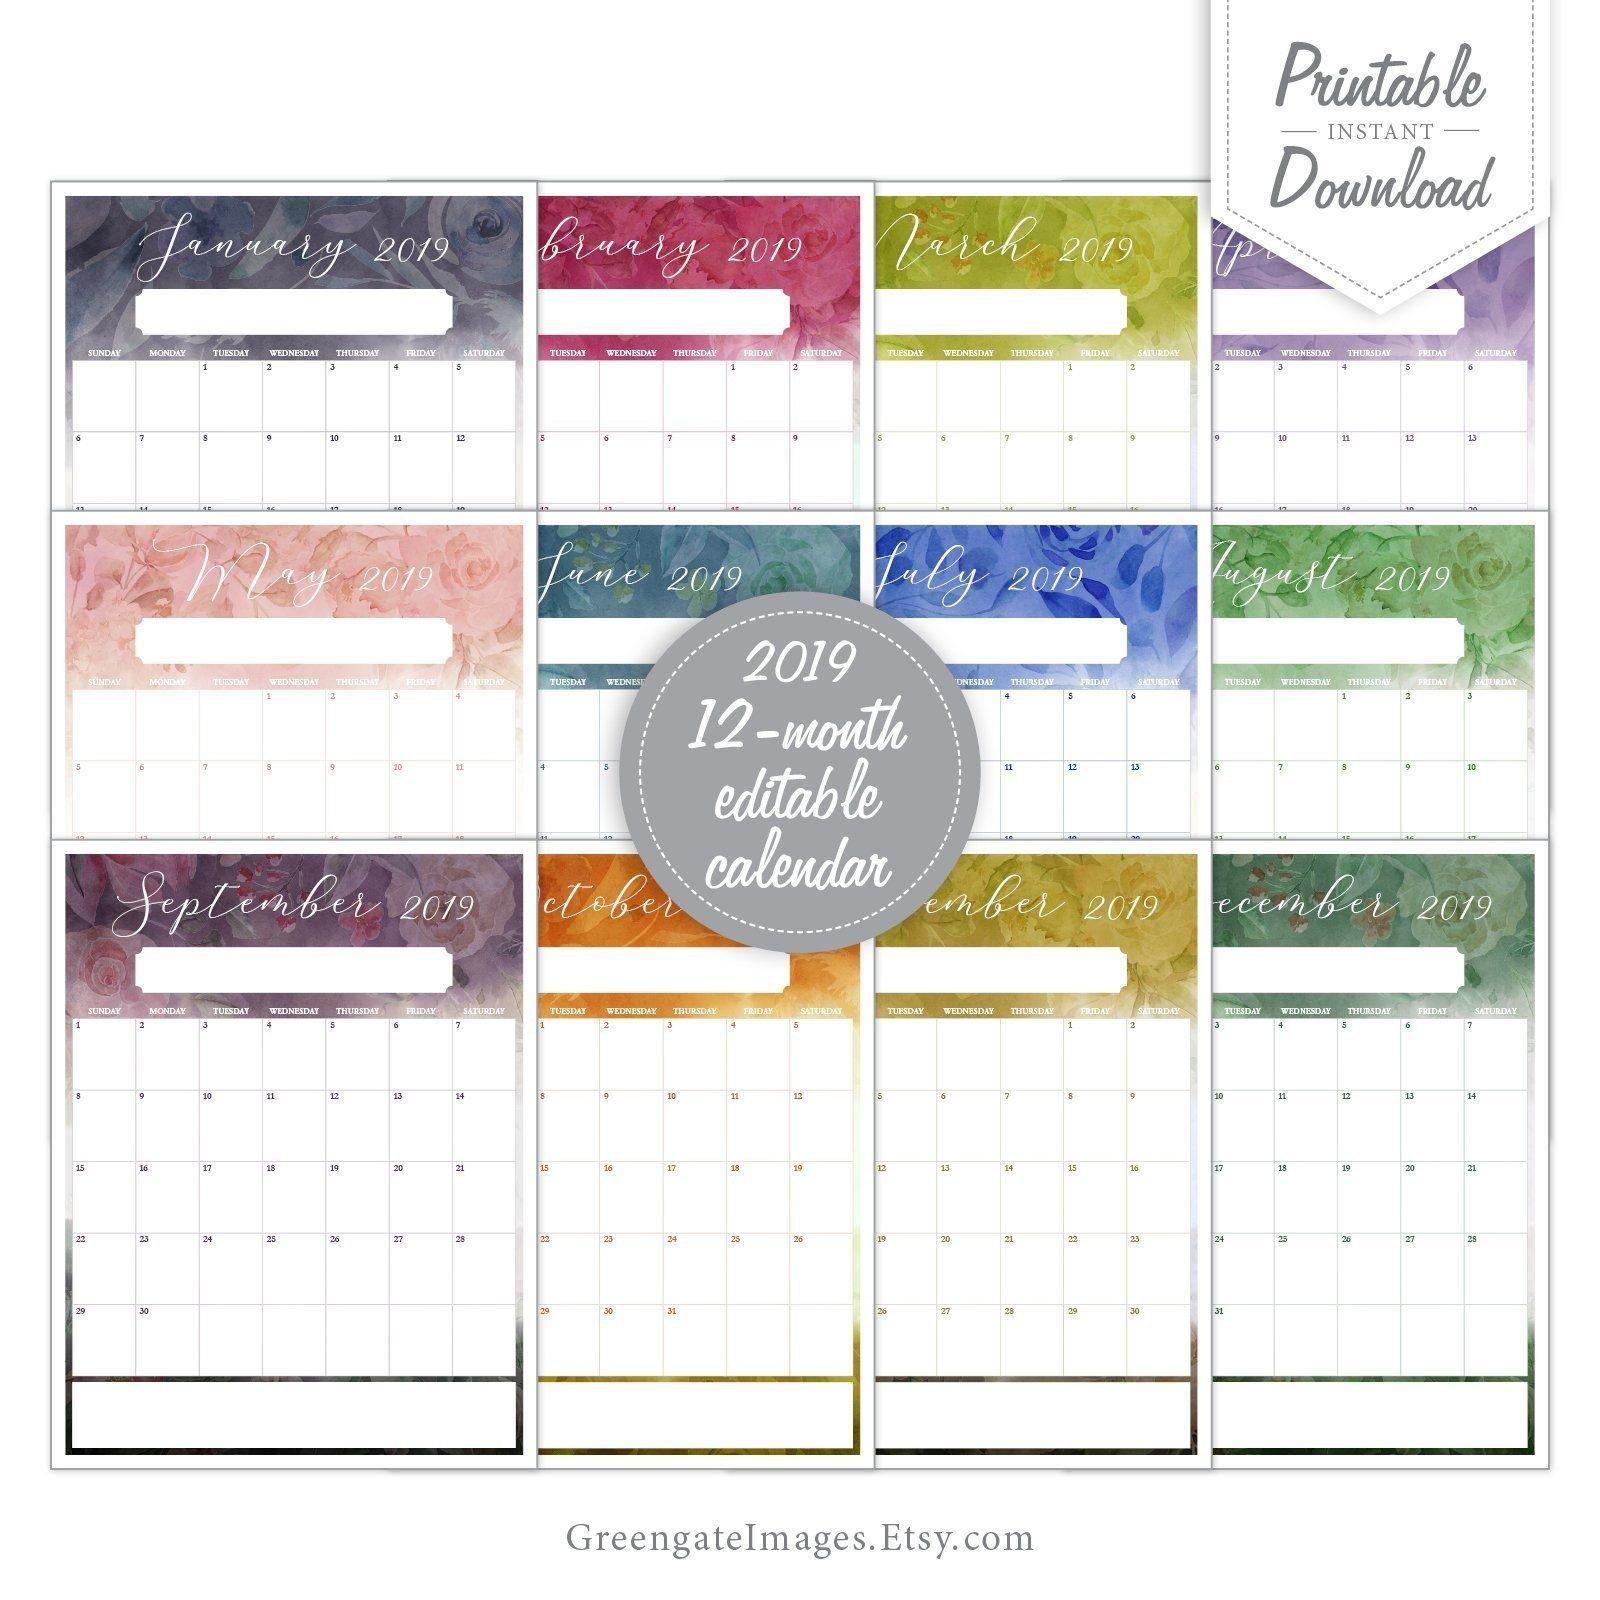 2019 Editable Calendar - Fillable Calendar, 12 Month 12 Month Editable Calendar